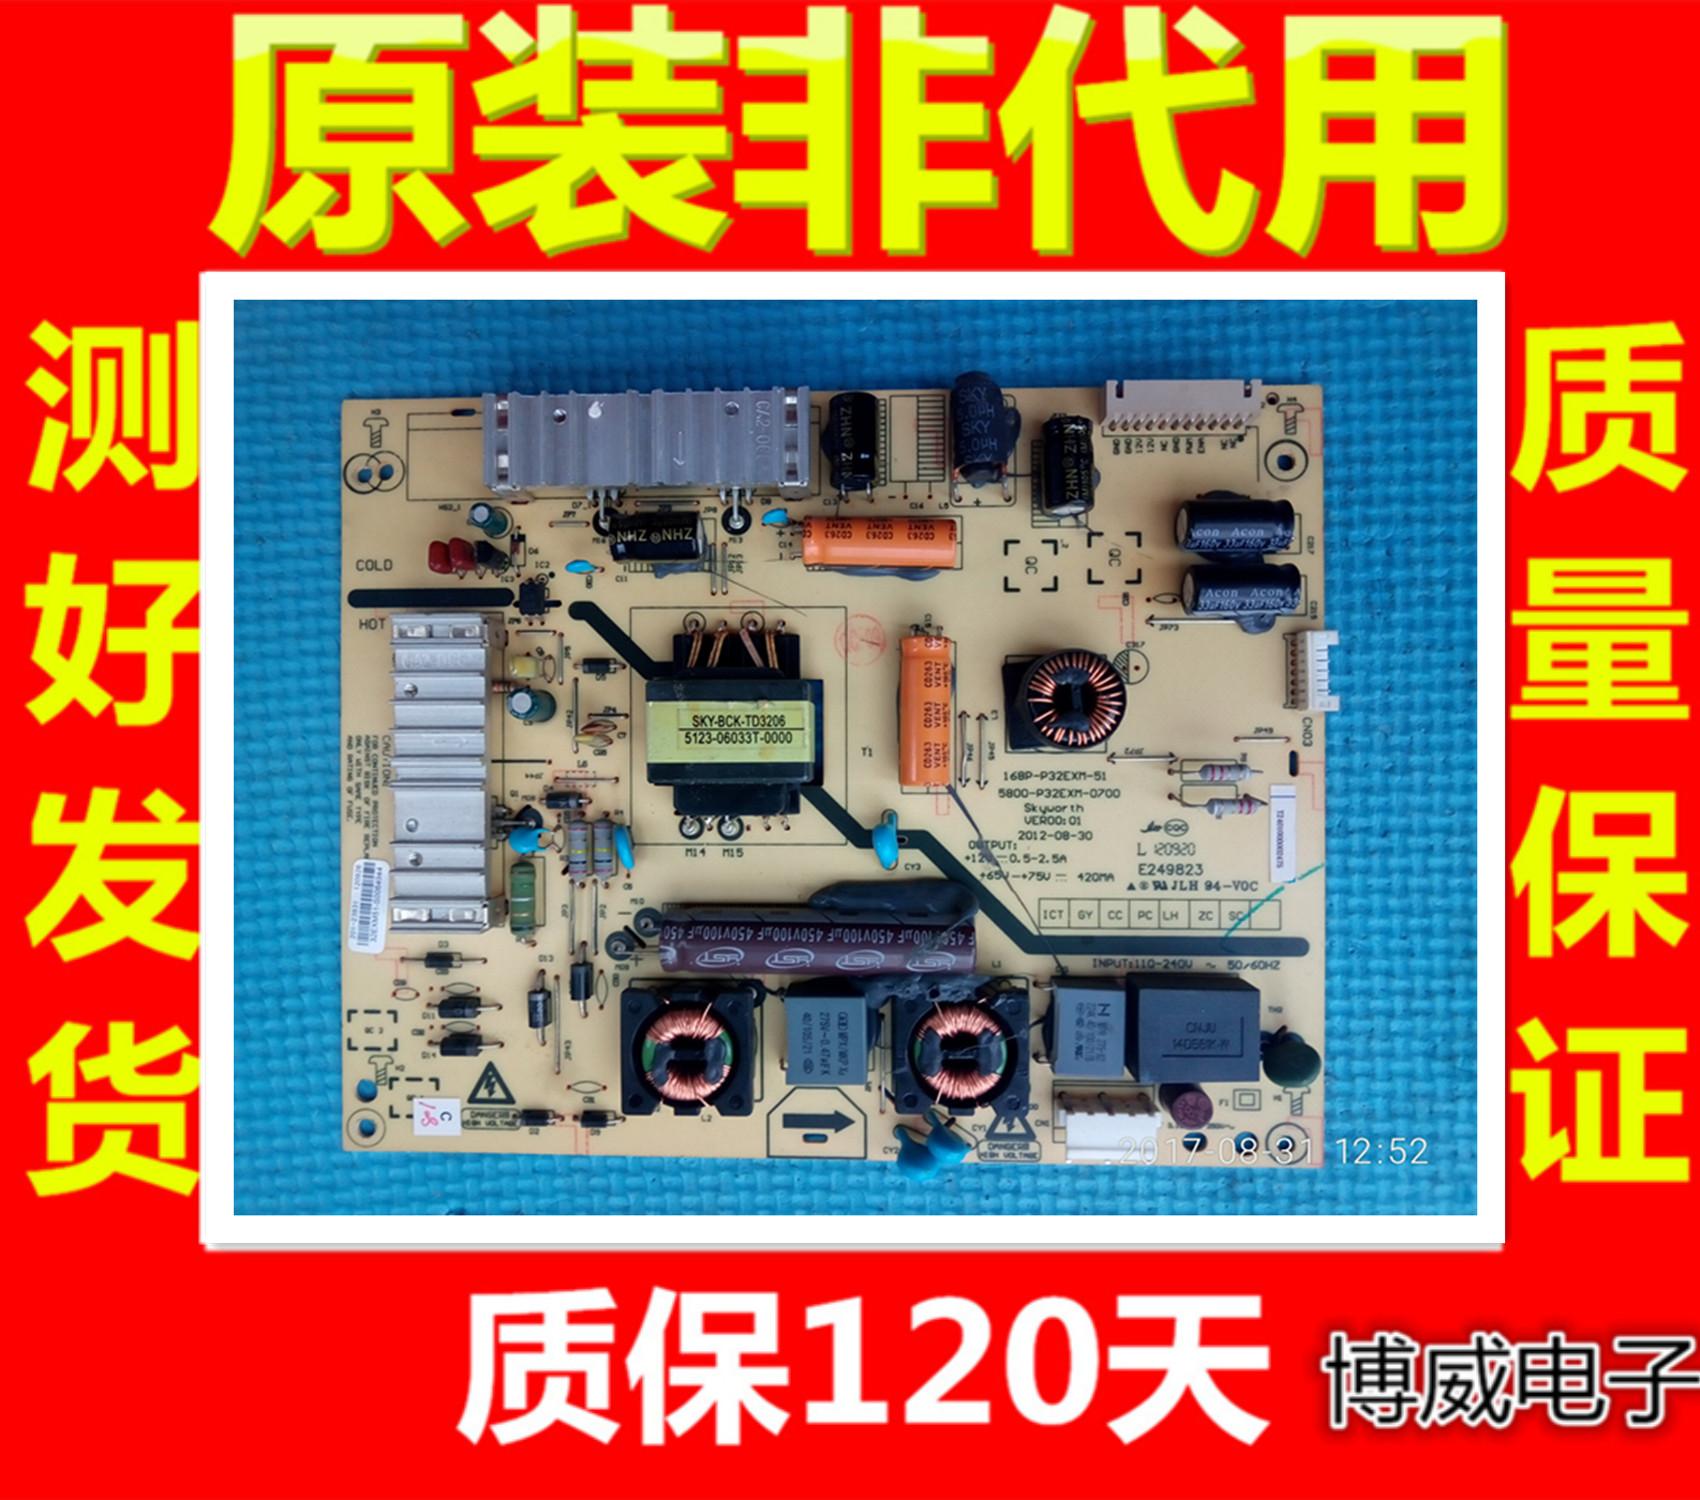 Original - 32 - Zoll - LCD - flachbild - TV skyworth 32E306C hochdruck - hintergrundbeleuchtung die Power plate Linie fahren